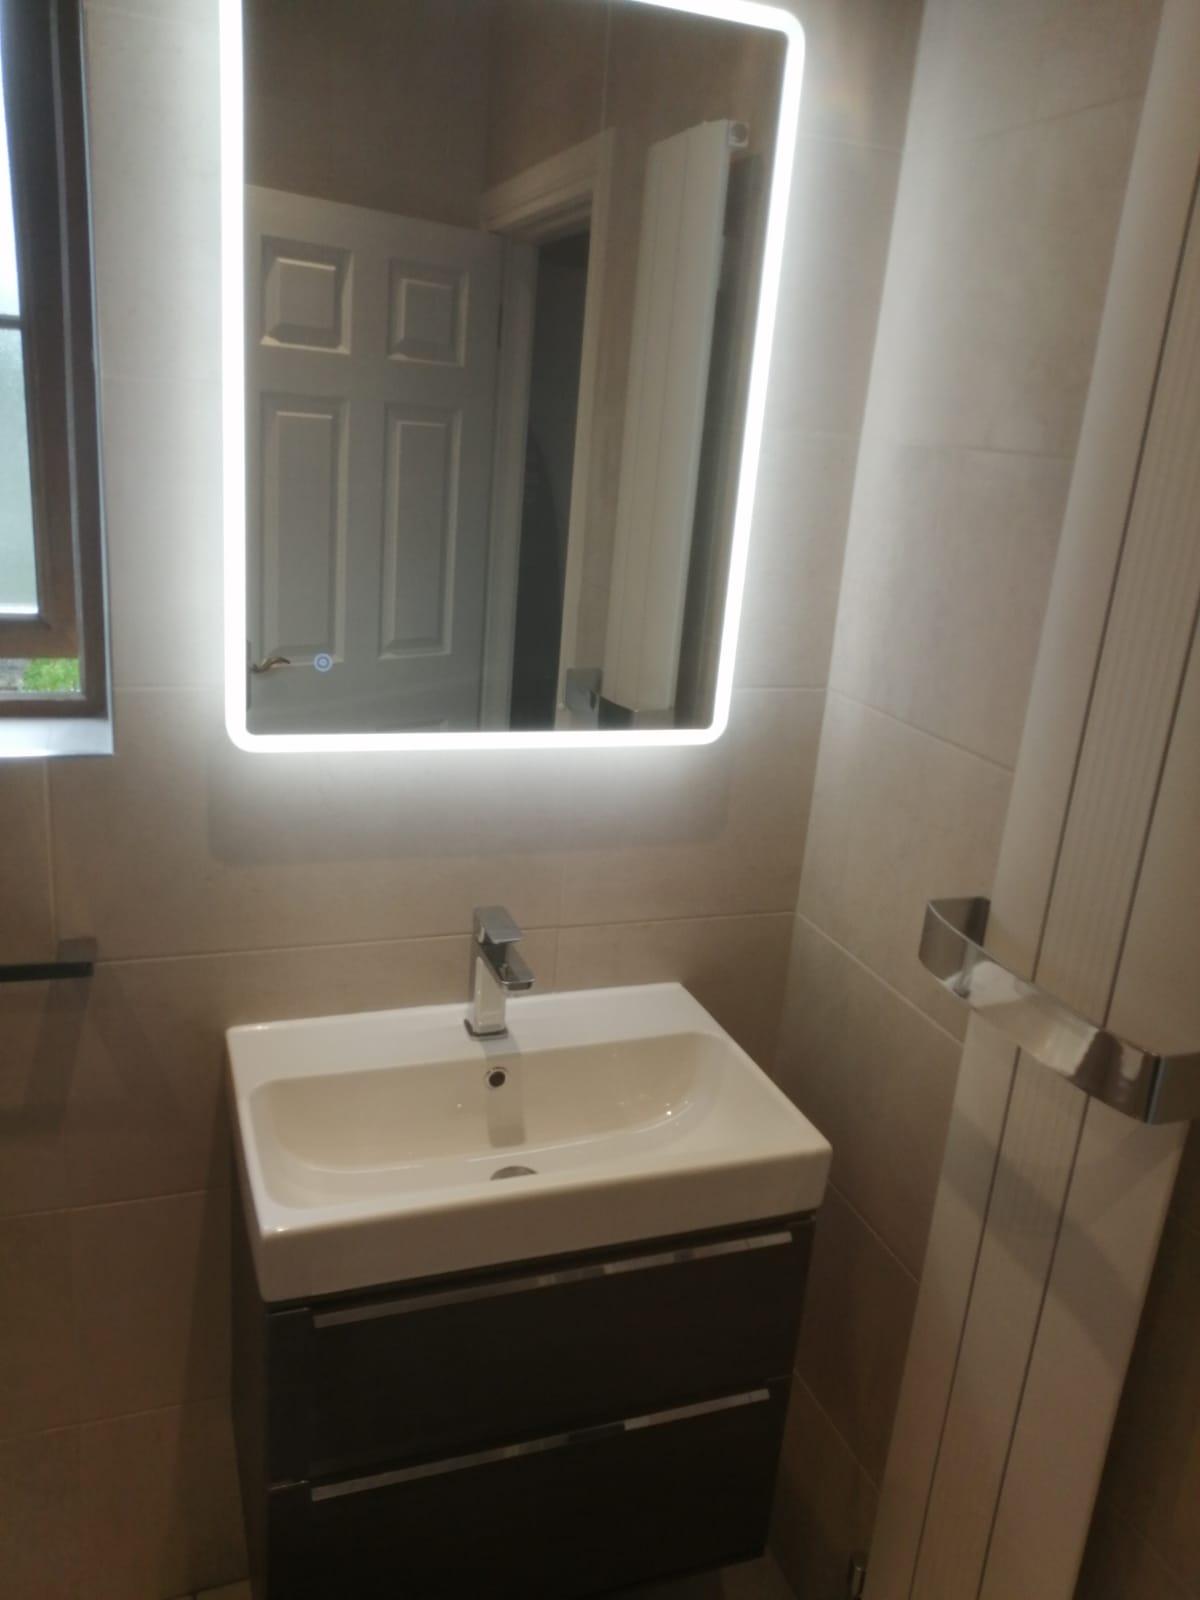 Another successful bathroom refurbishment